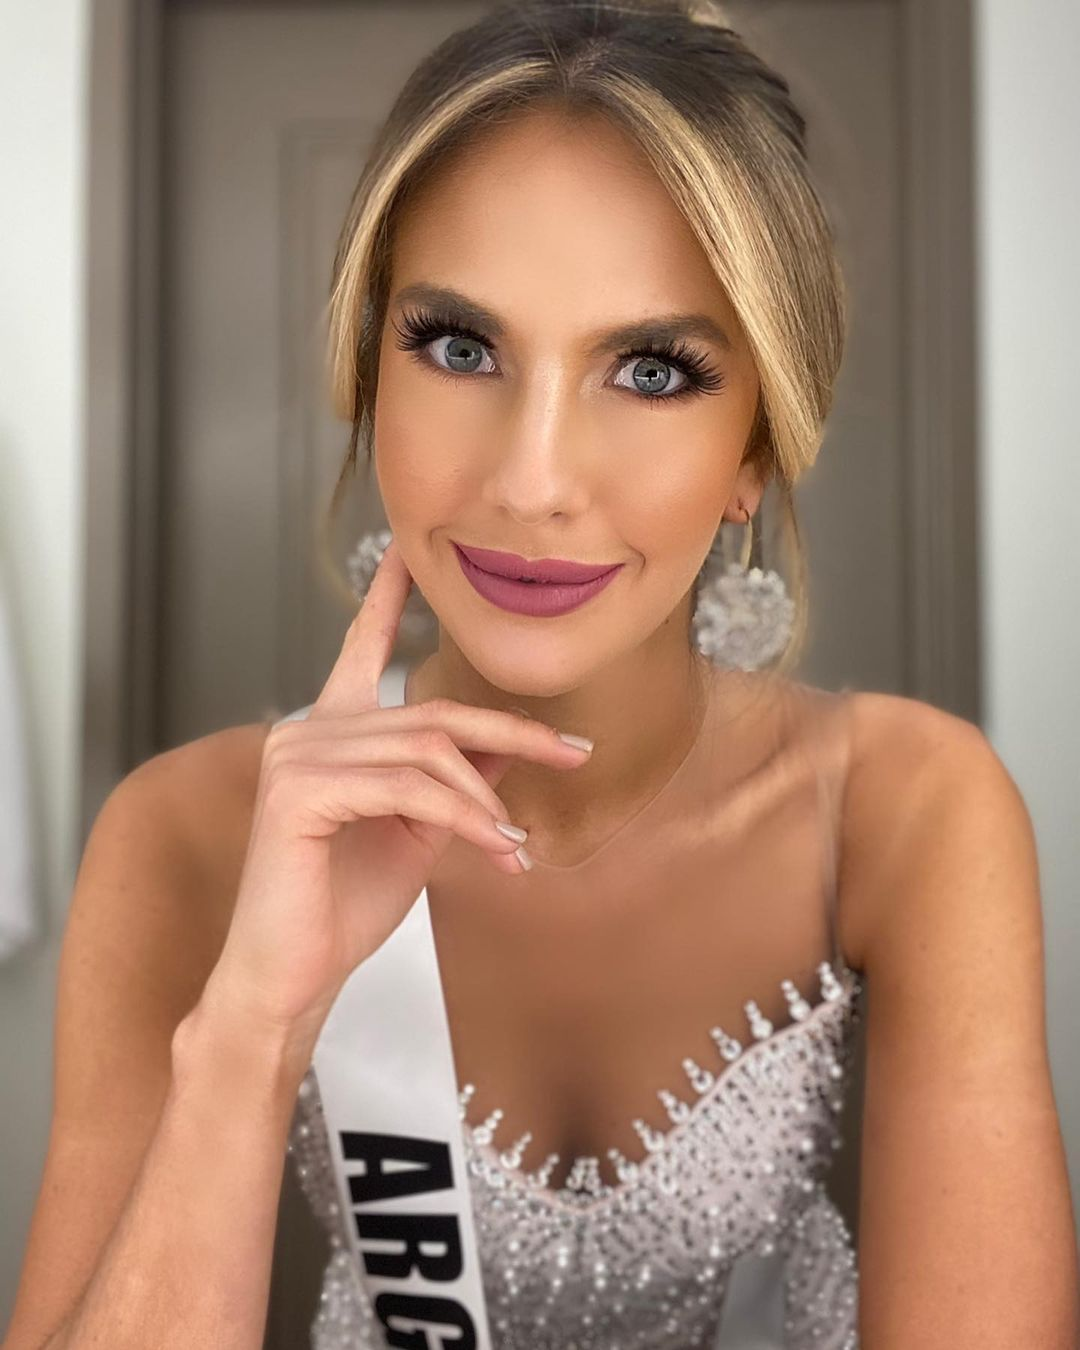 alina akselrad, top 21 de miss universe 2020. - Página 12 20750217